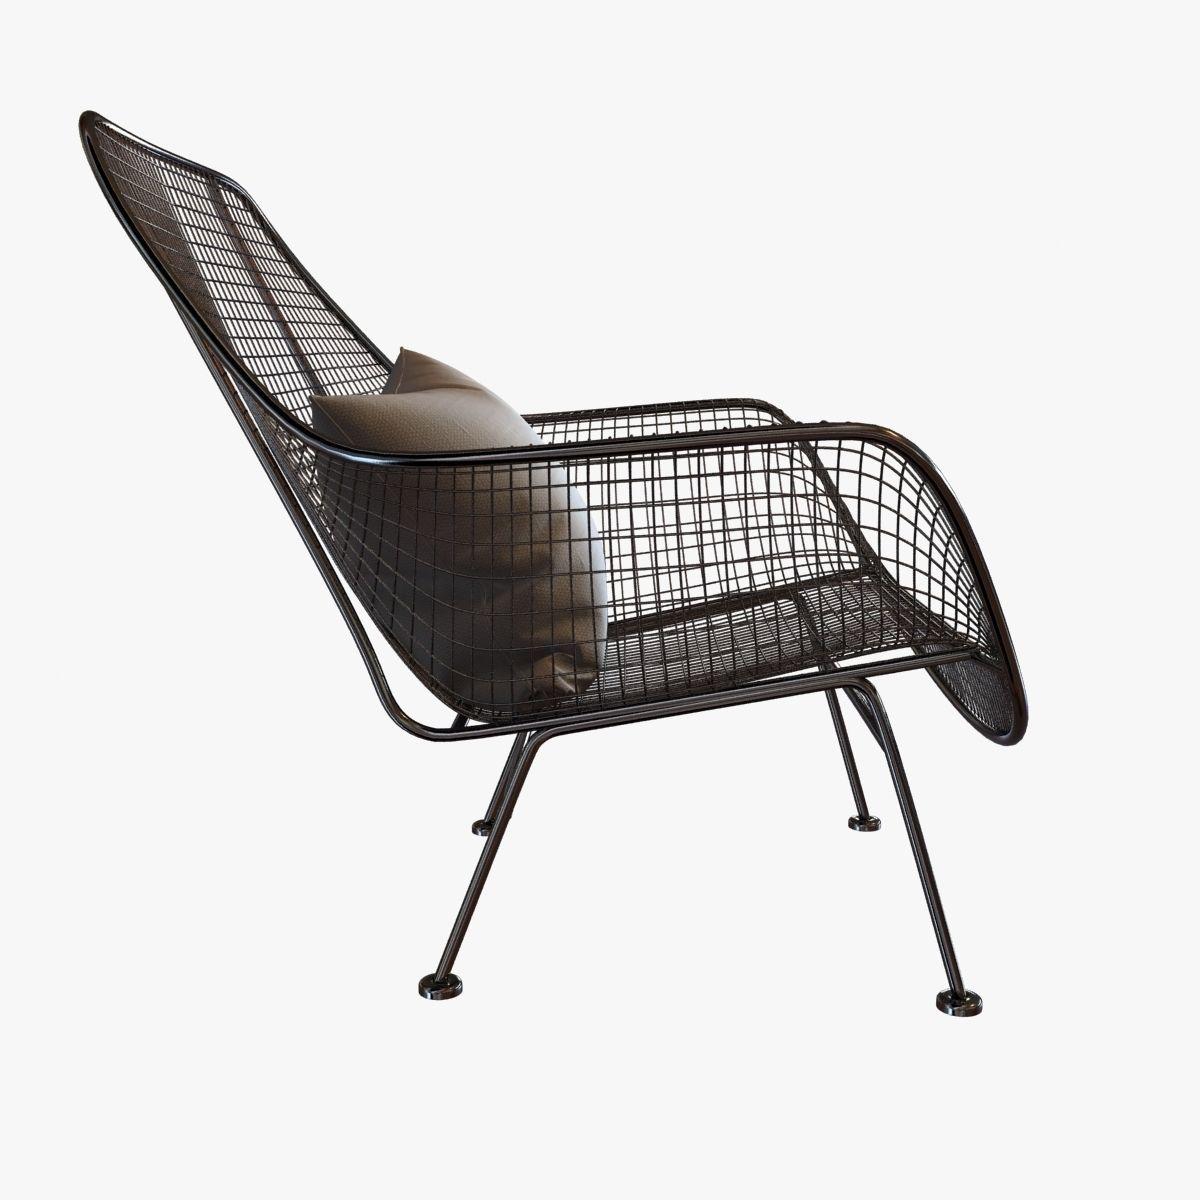 lounge chair outside chairs under 100 dollars mid century sculptura garden by woodard 3d model max obj mtl 3ds fbx